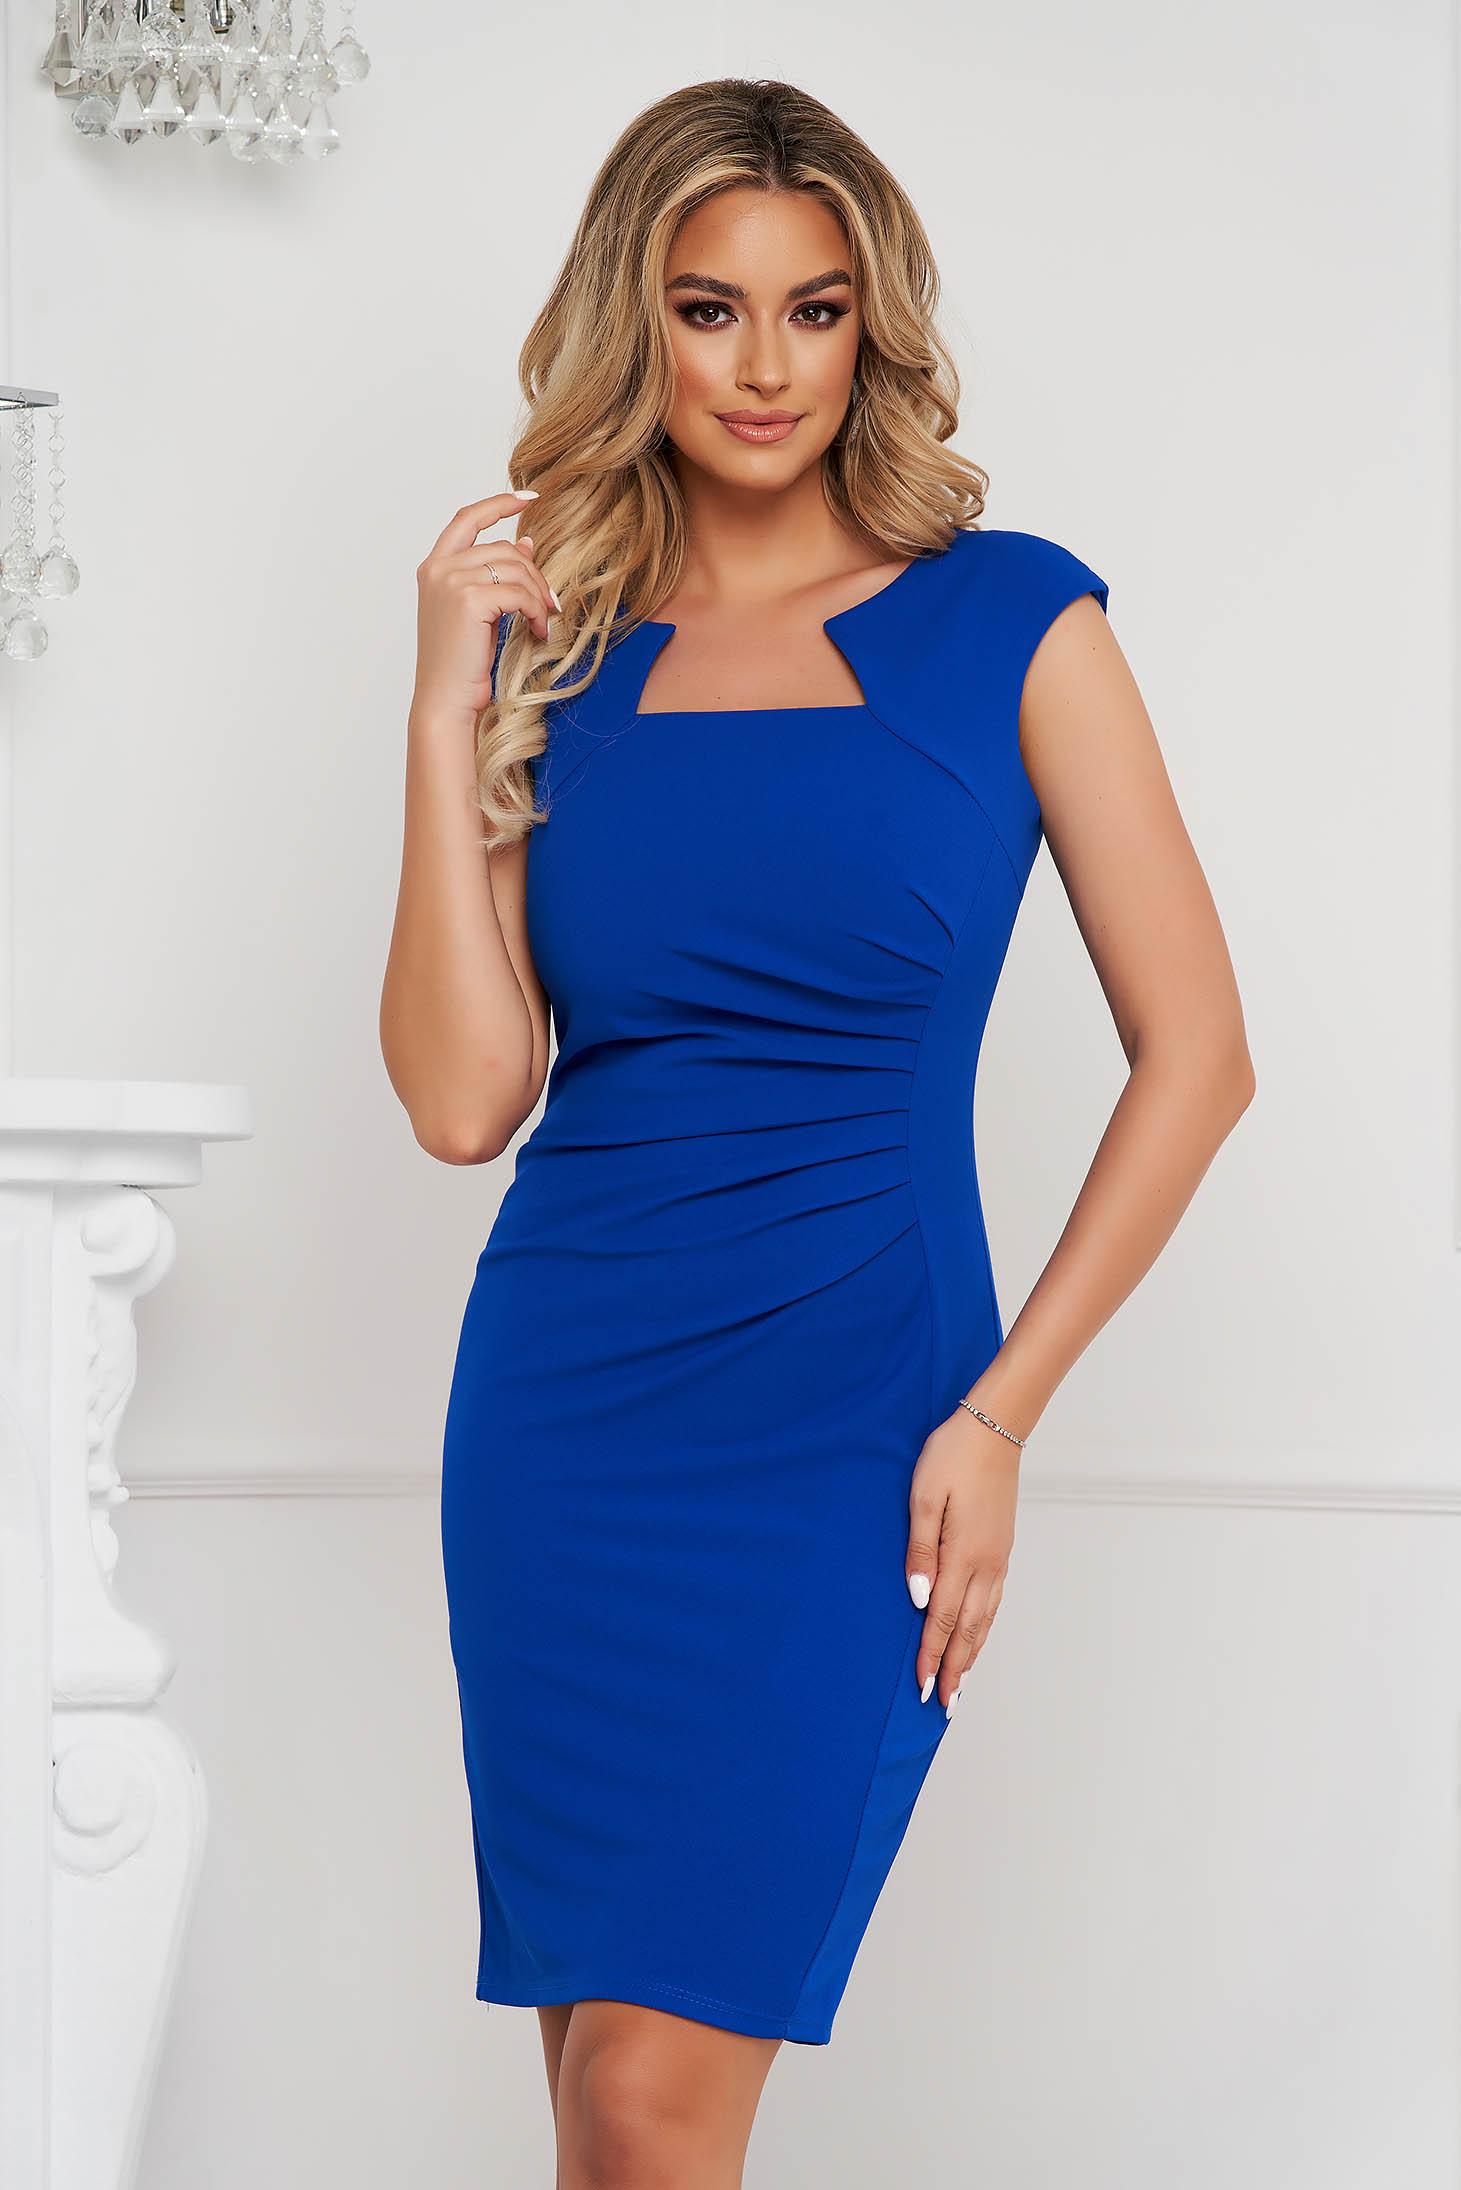 Blue dress office short cut pencil from elastic fabric short sleeves